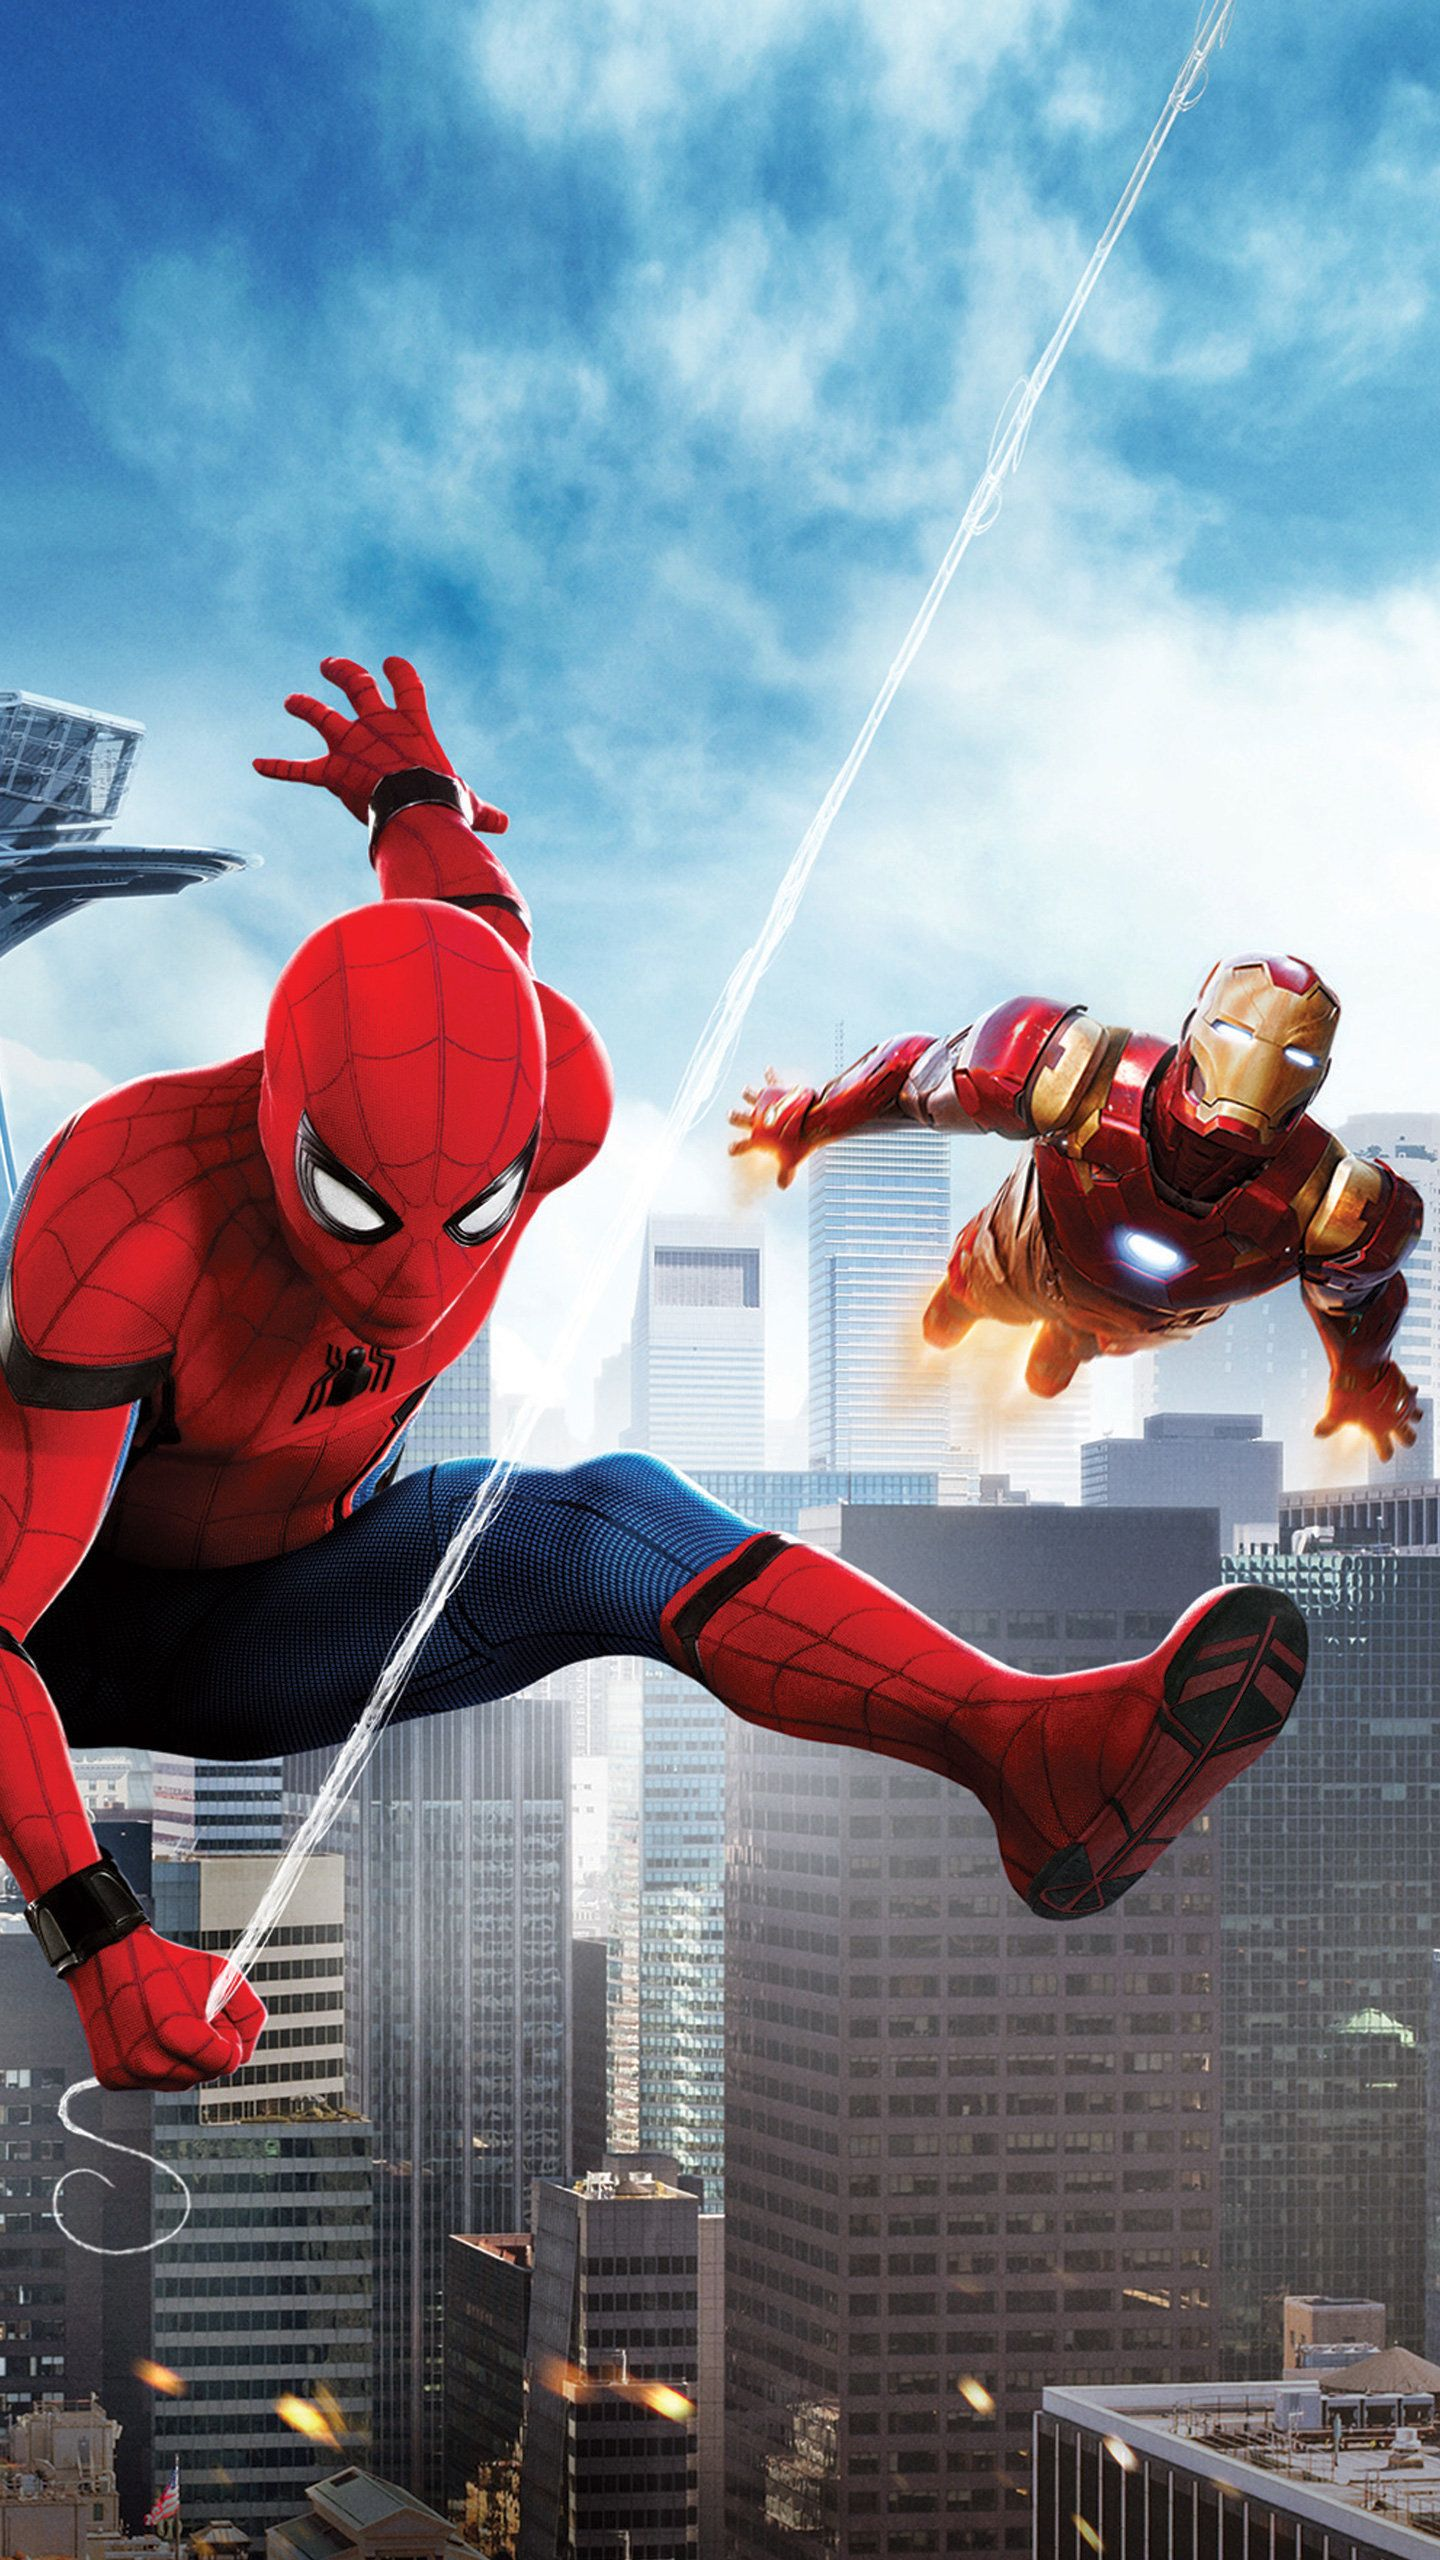 Spiderman And Ironman Wallpaper : spiderman, ironman, wallpaper, Spiderman, Superheroes, Wallpapers, Photos, Pictures, Marvel, Superhero, Posters,, Spiderman,, Wallpaper